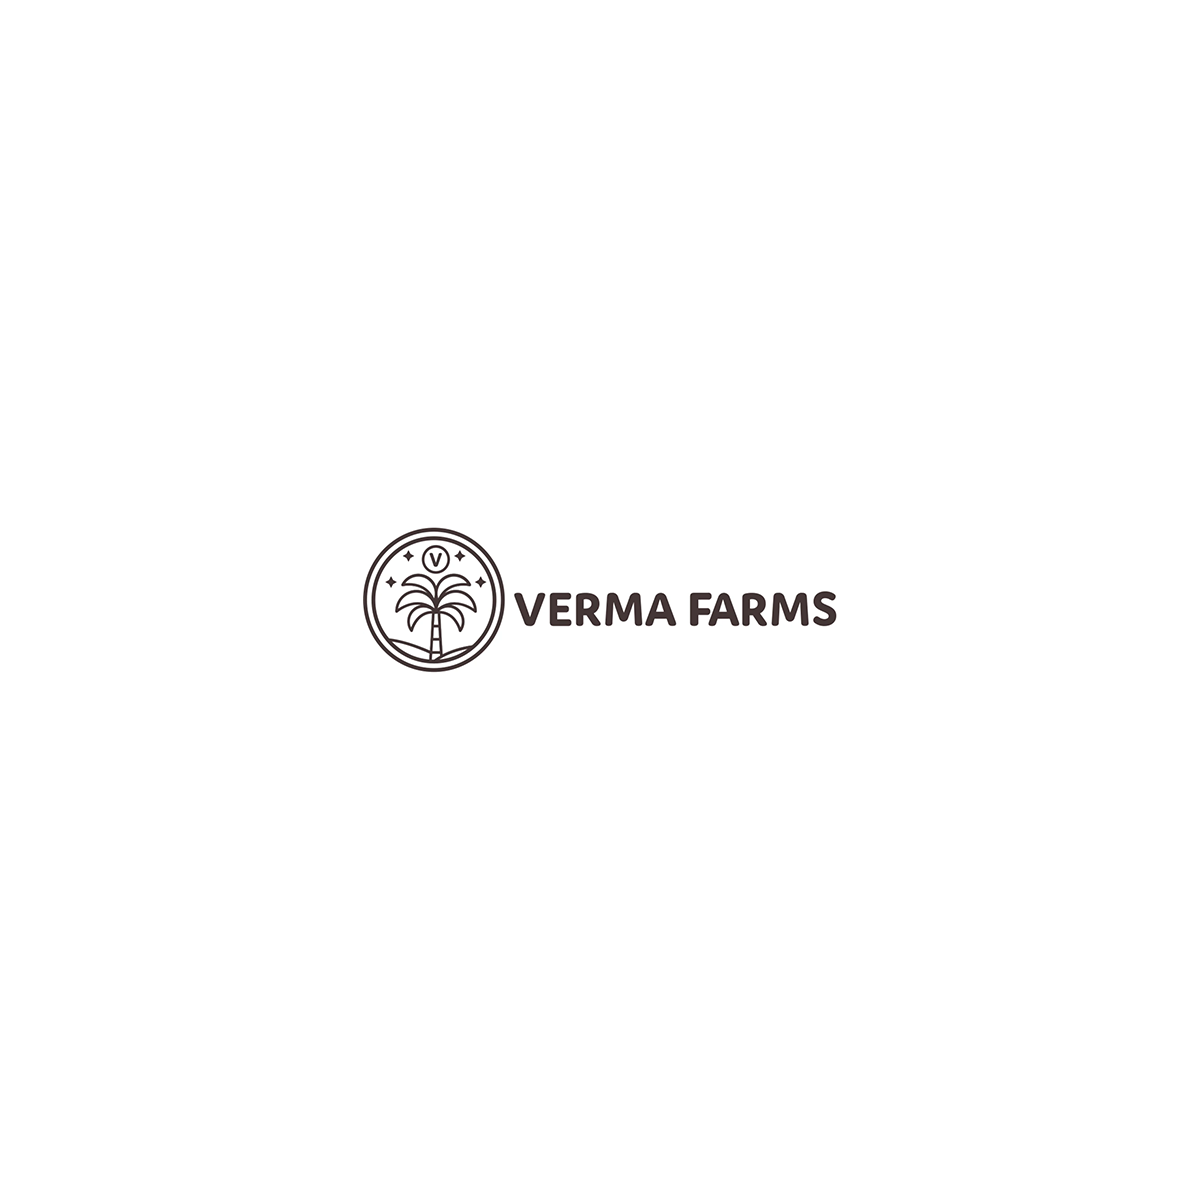 Verma Farms